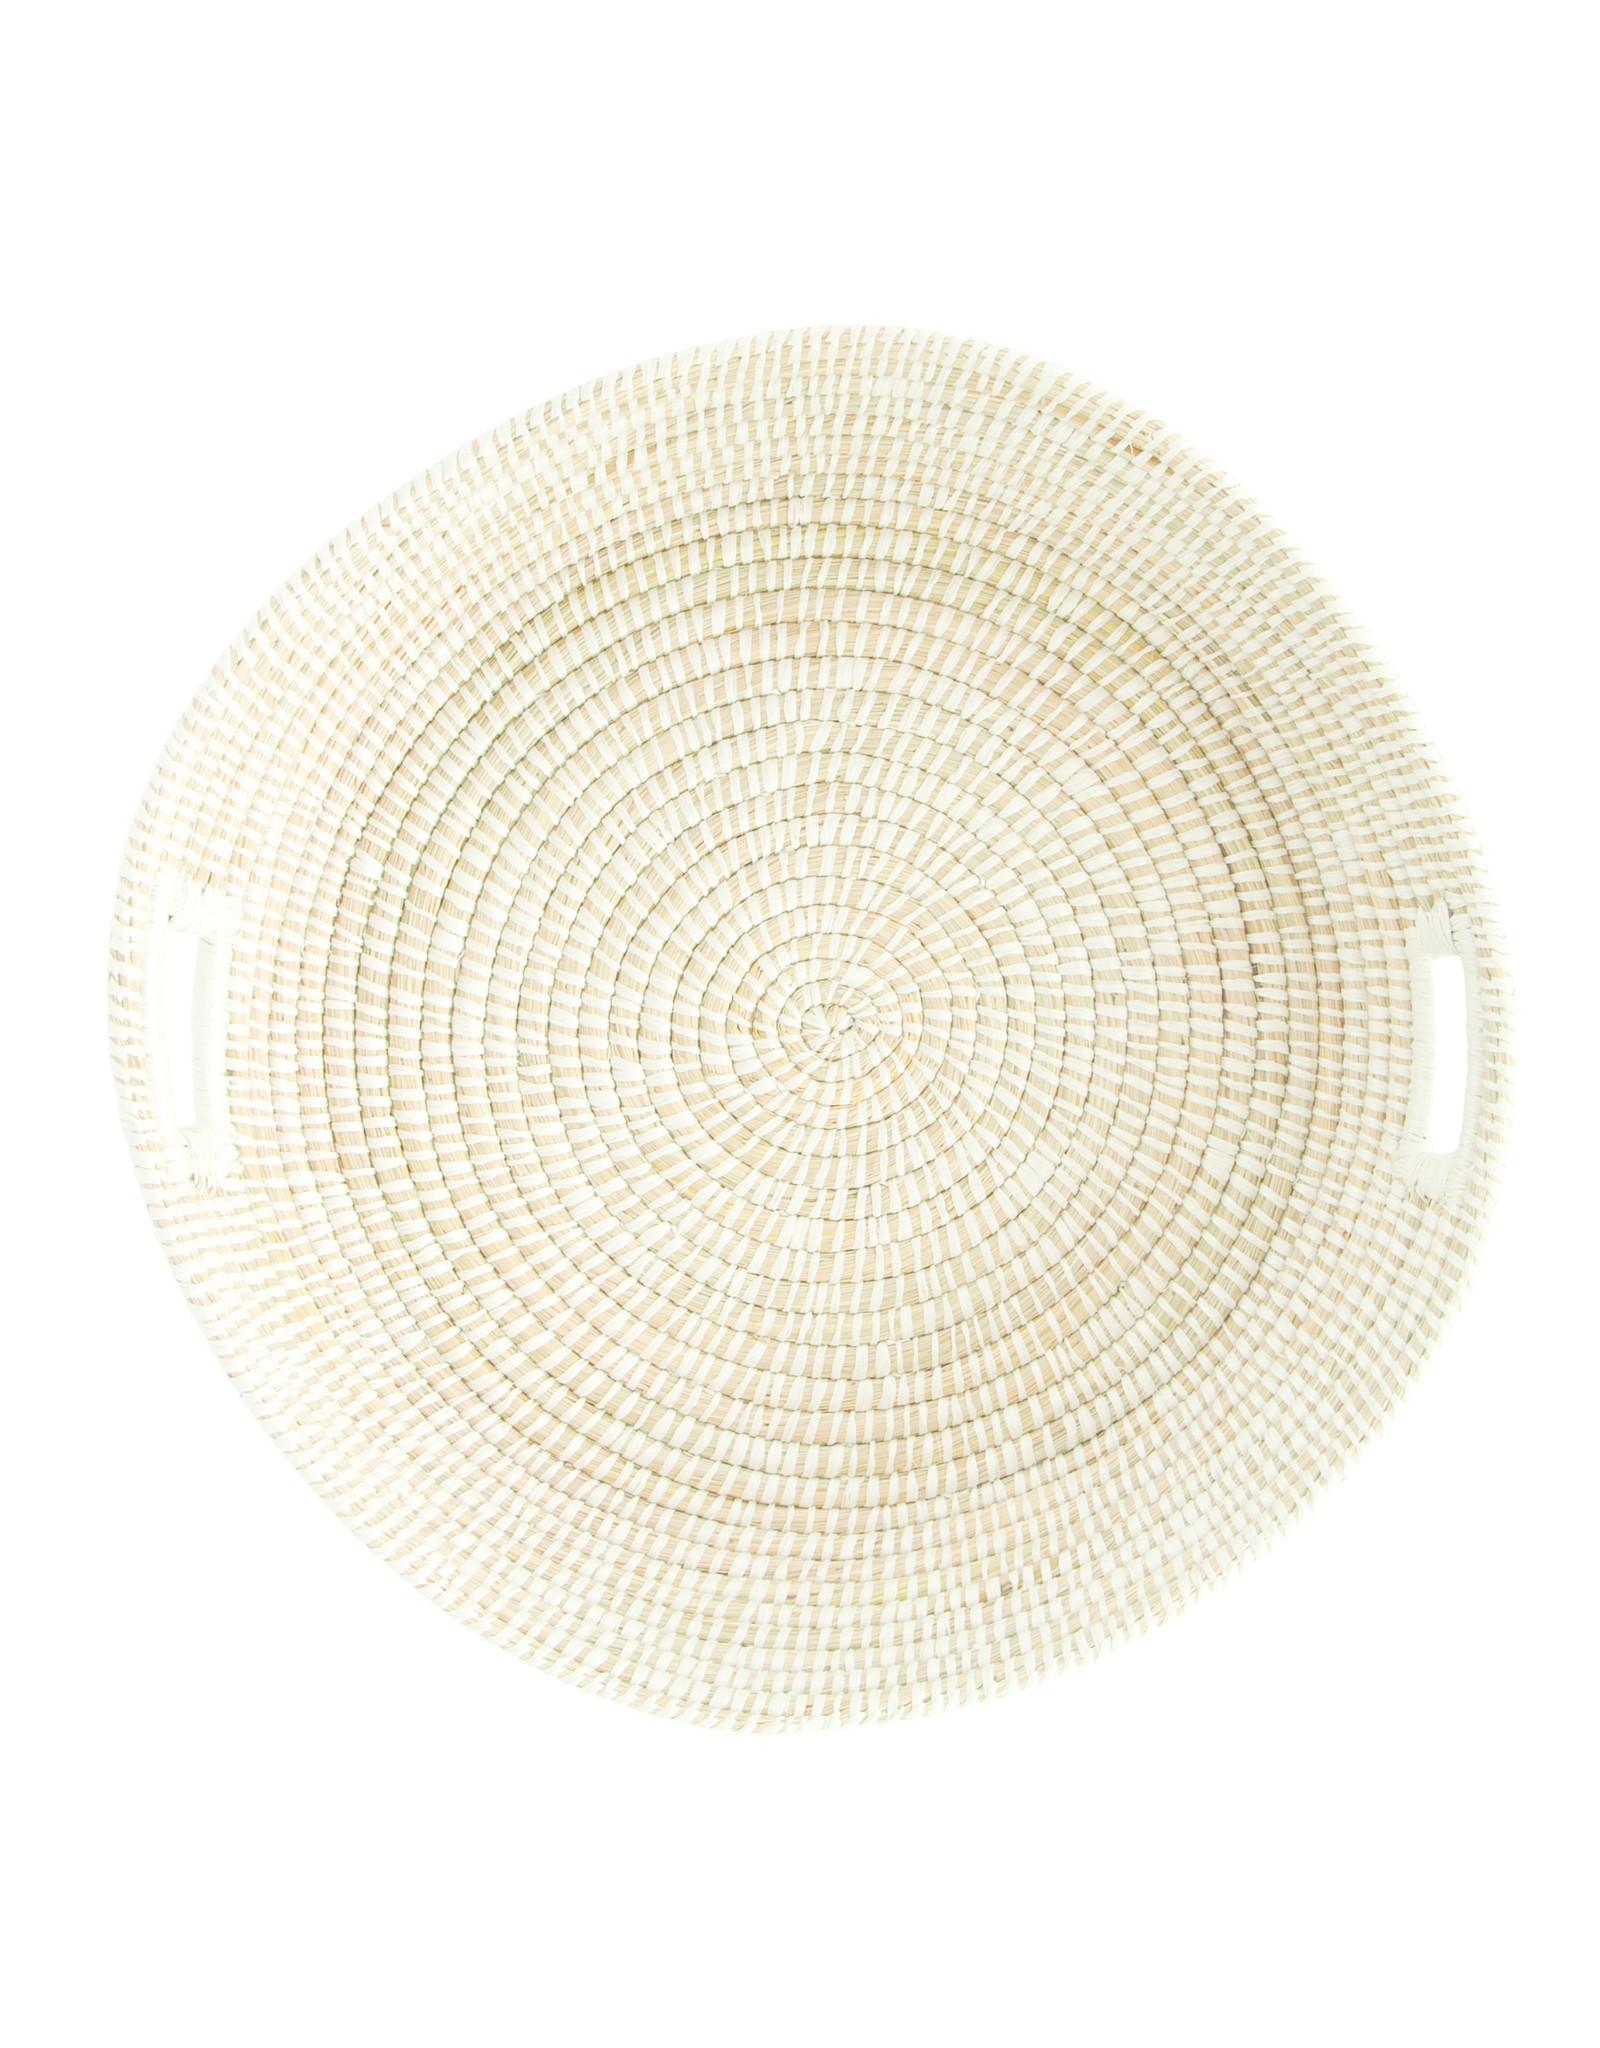 Website Hand-Woven Basket with Handles